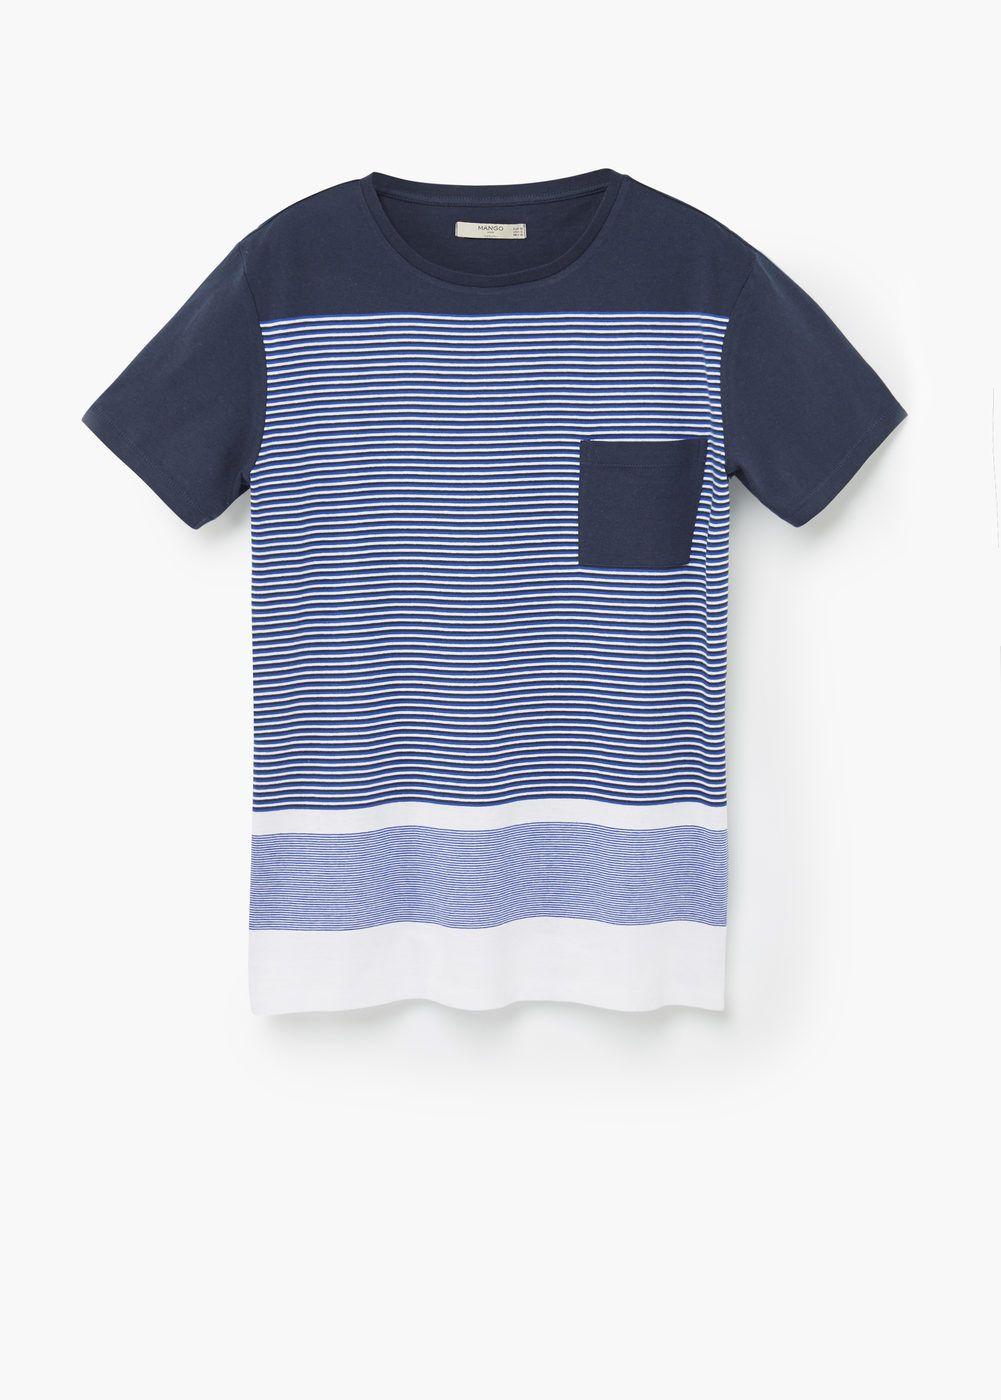 Striped cotton t shirt Men | Polo t shirts, Mens garb